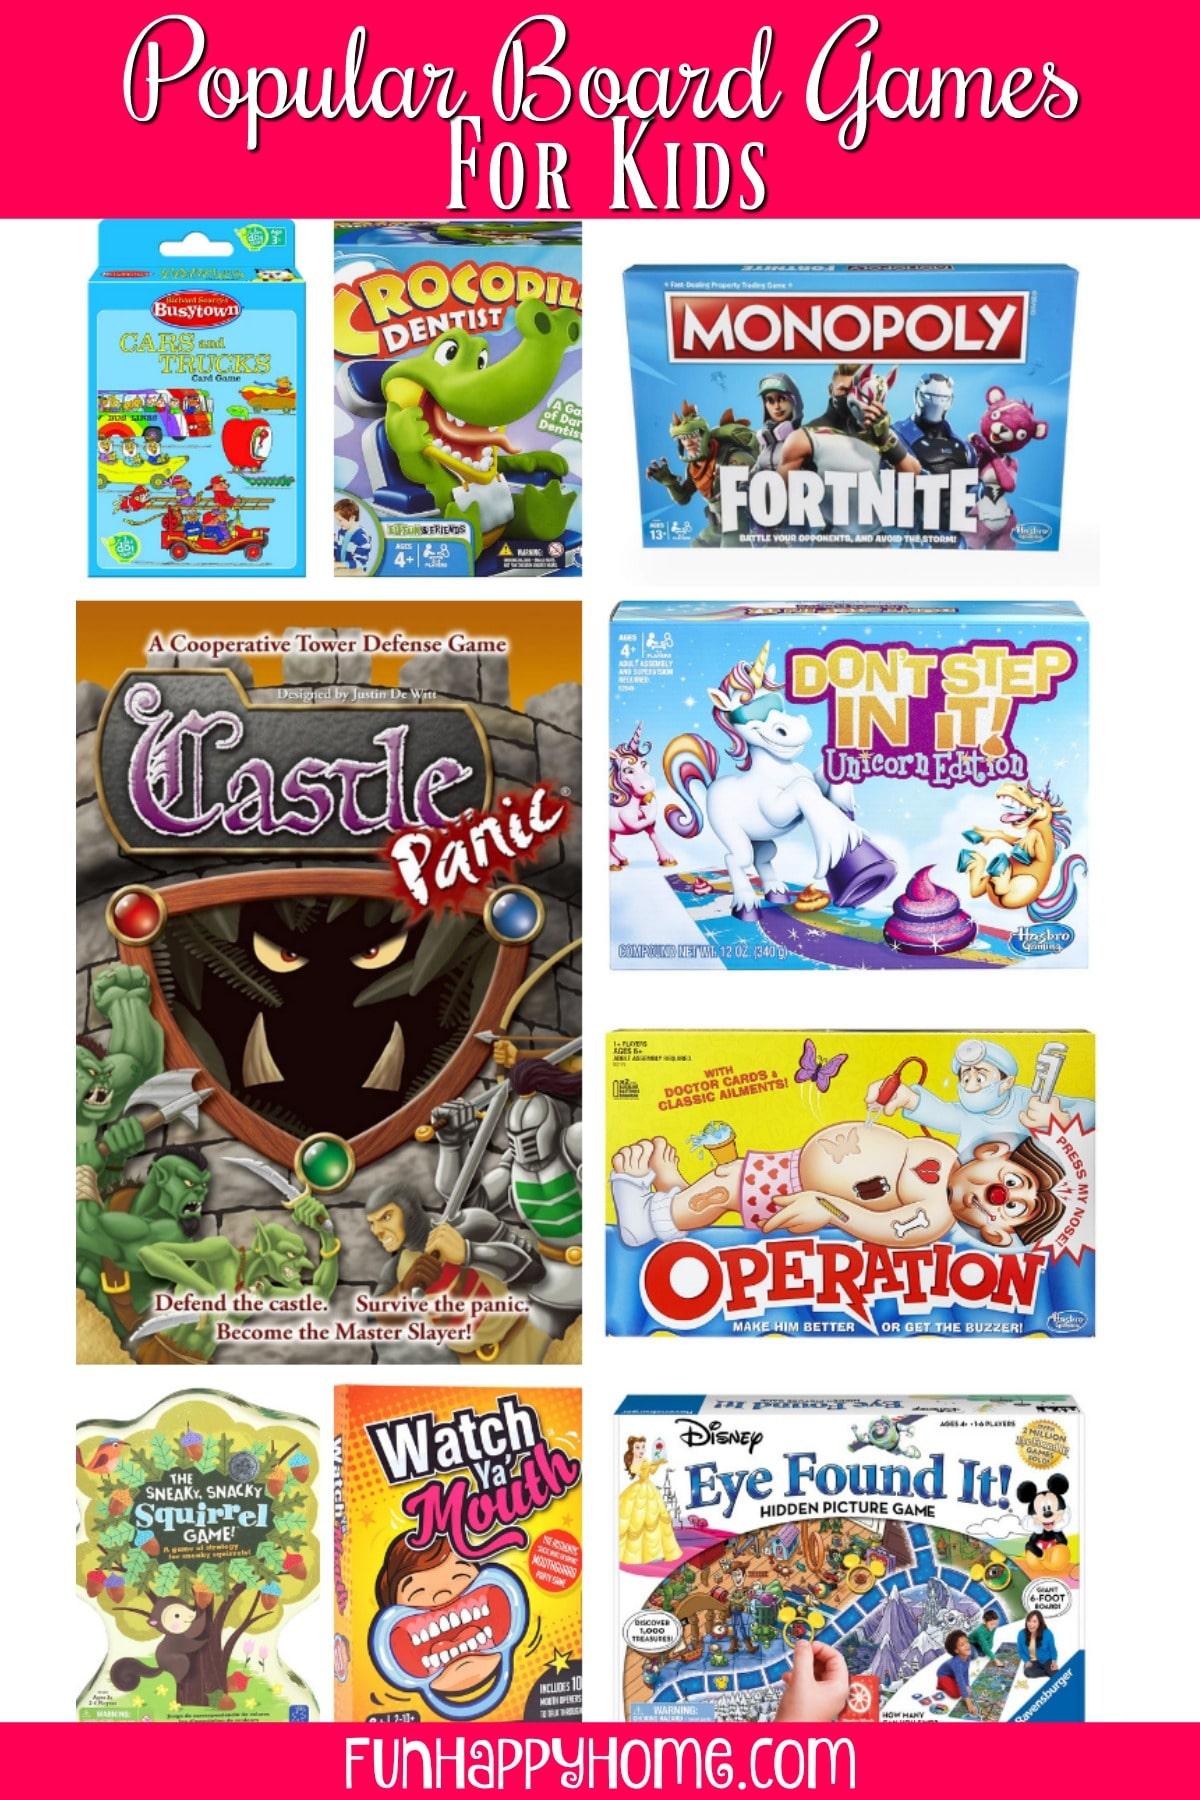 Popular Board Games for Kids